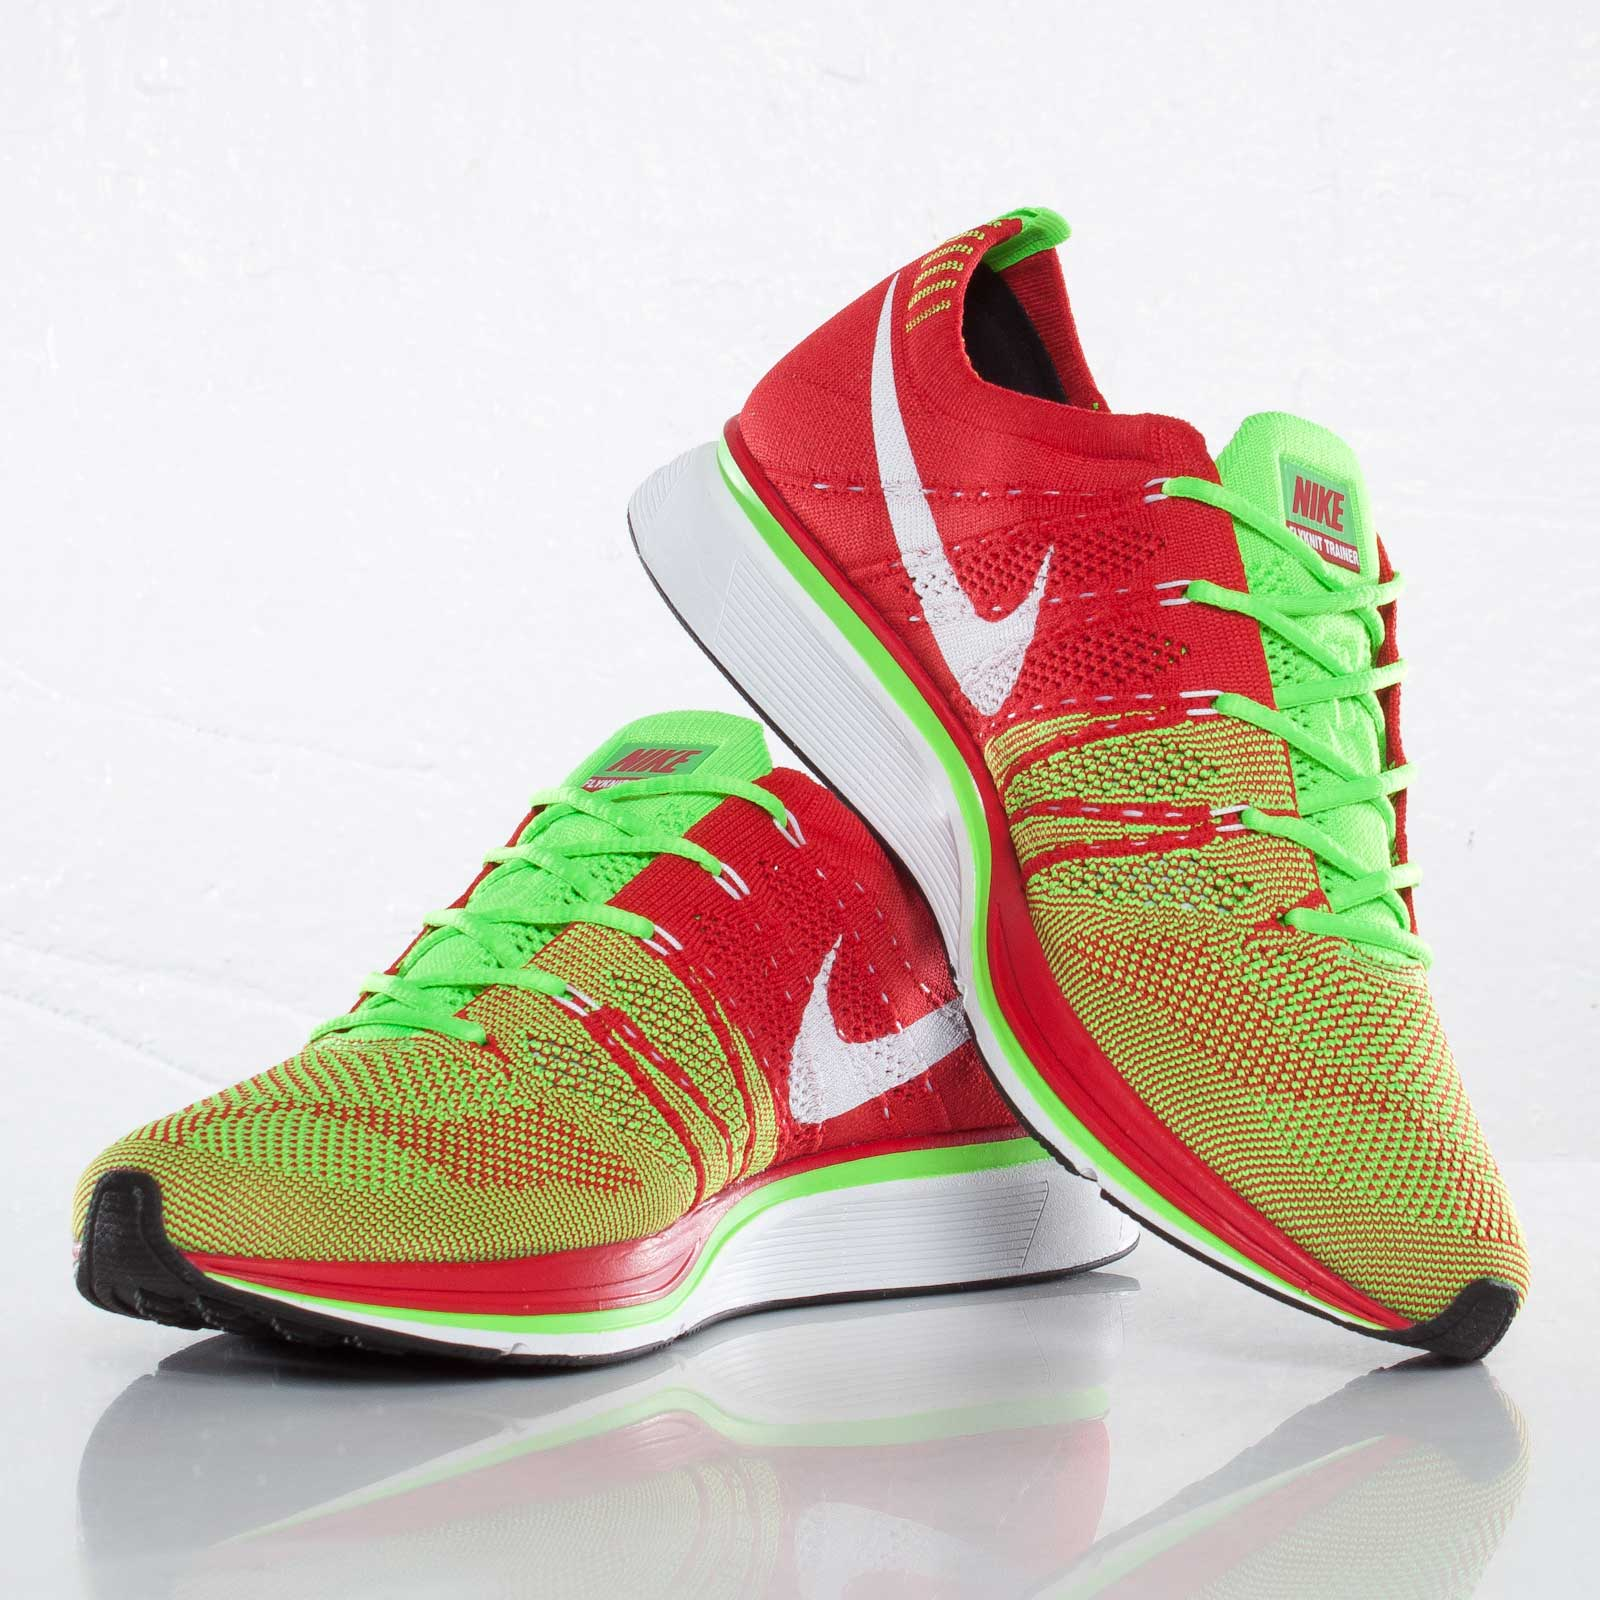 sale retailer 830c9 f4acd Nike Flyknit Trainer+ - 532984-631 - Sneakersnstuff   sneakers ...